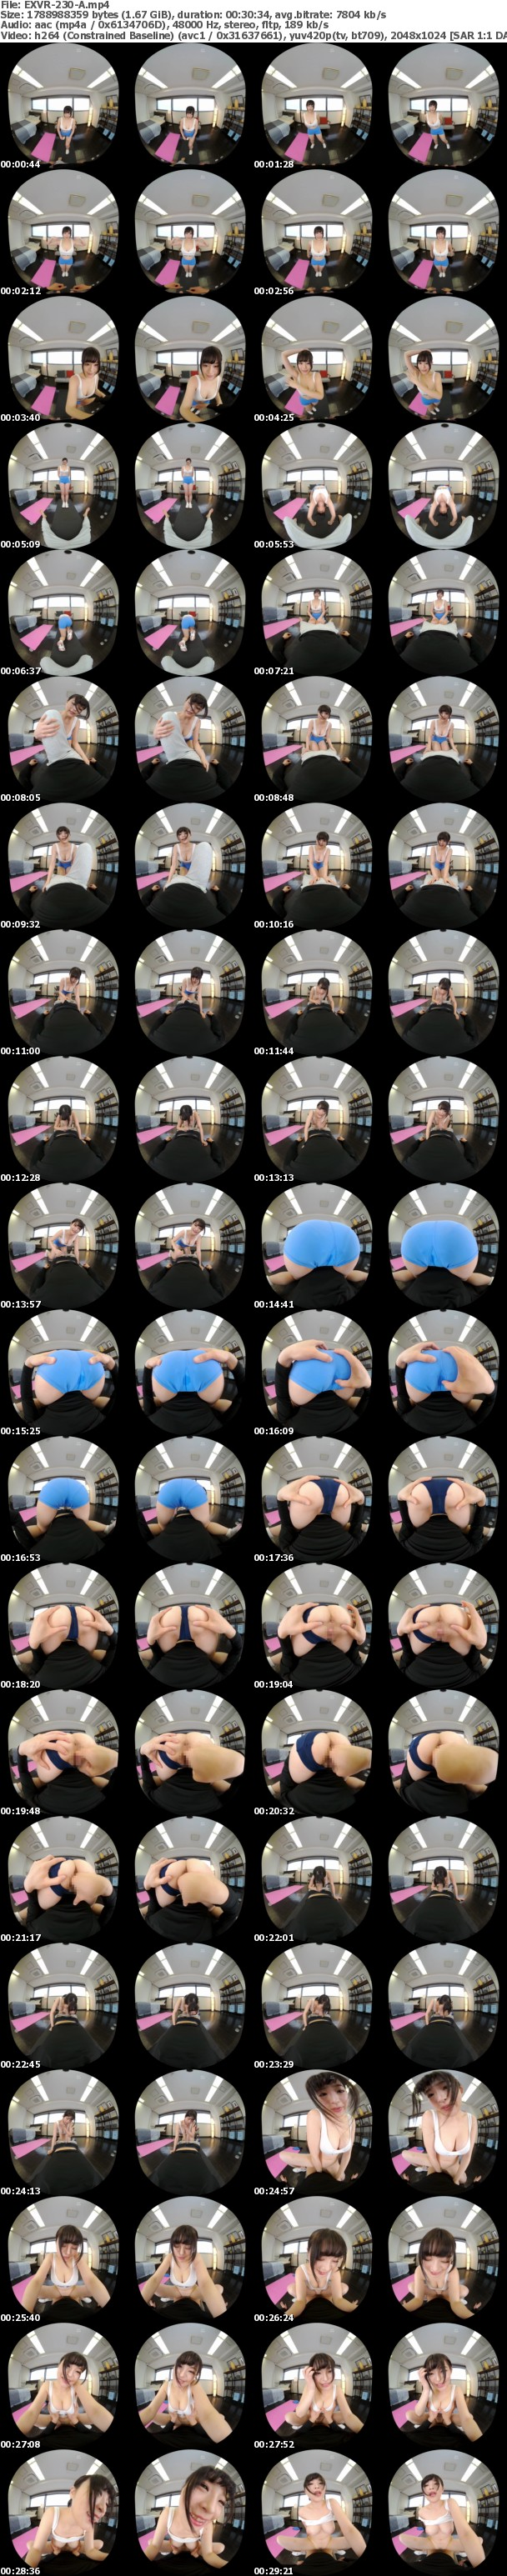 (VR) EXVR-230 美巨乳カリスマインストラクターSさんと秘密の汗だくナマSEXトレーニング